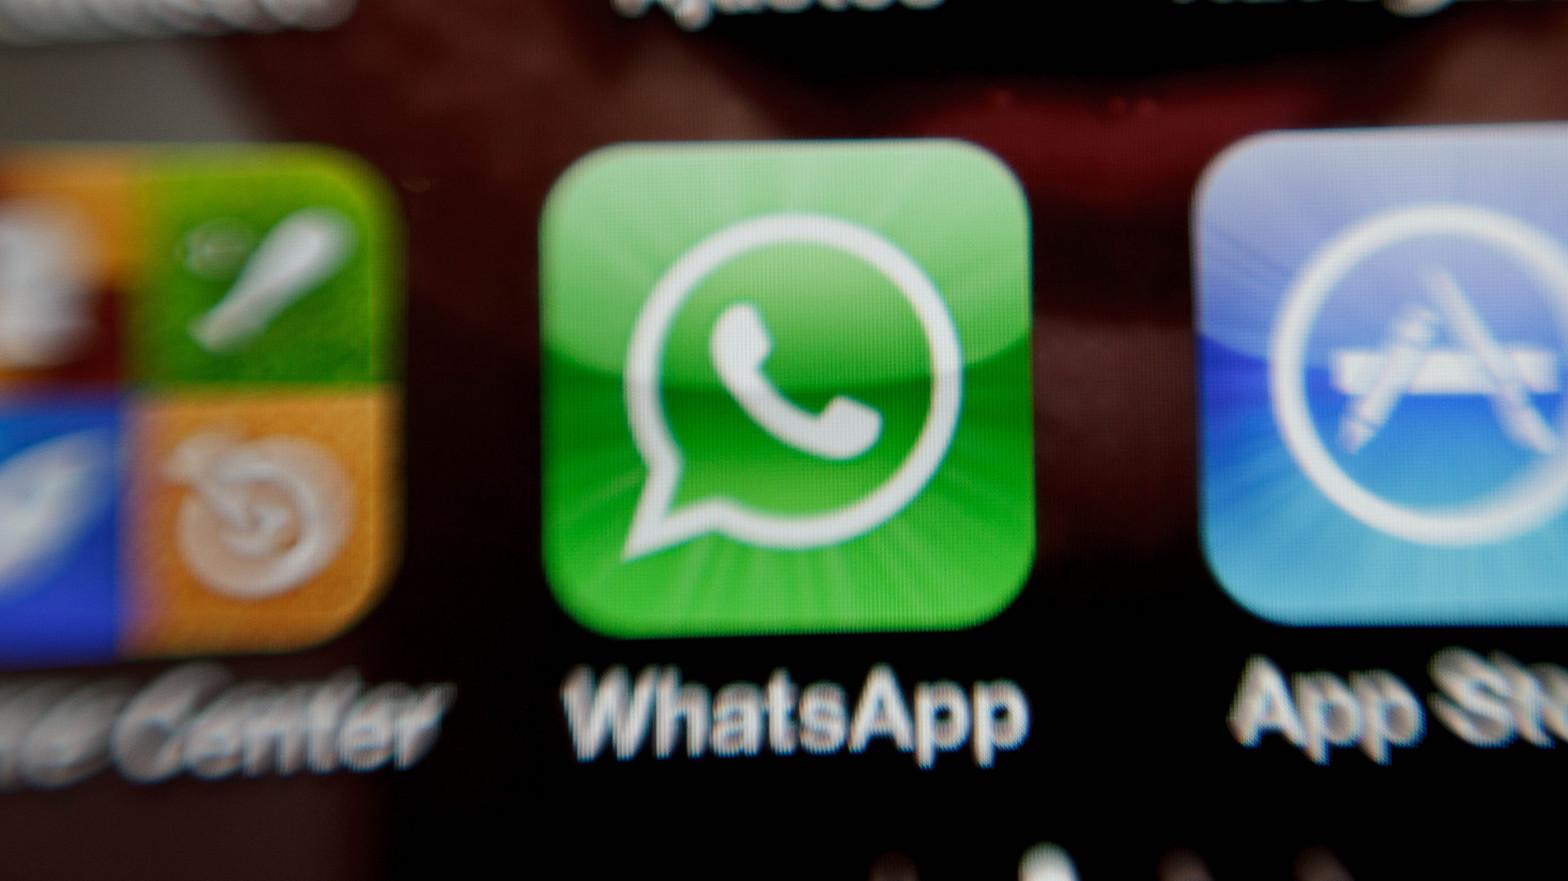 Whatsapp e Instagram sufren una caída a nivel mundial